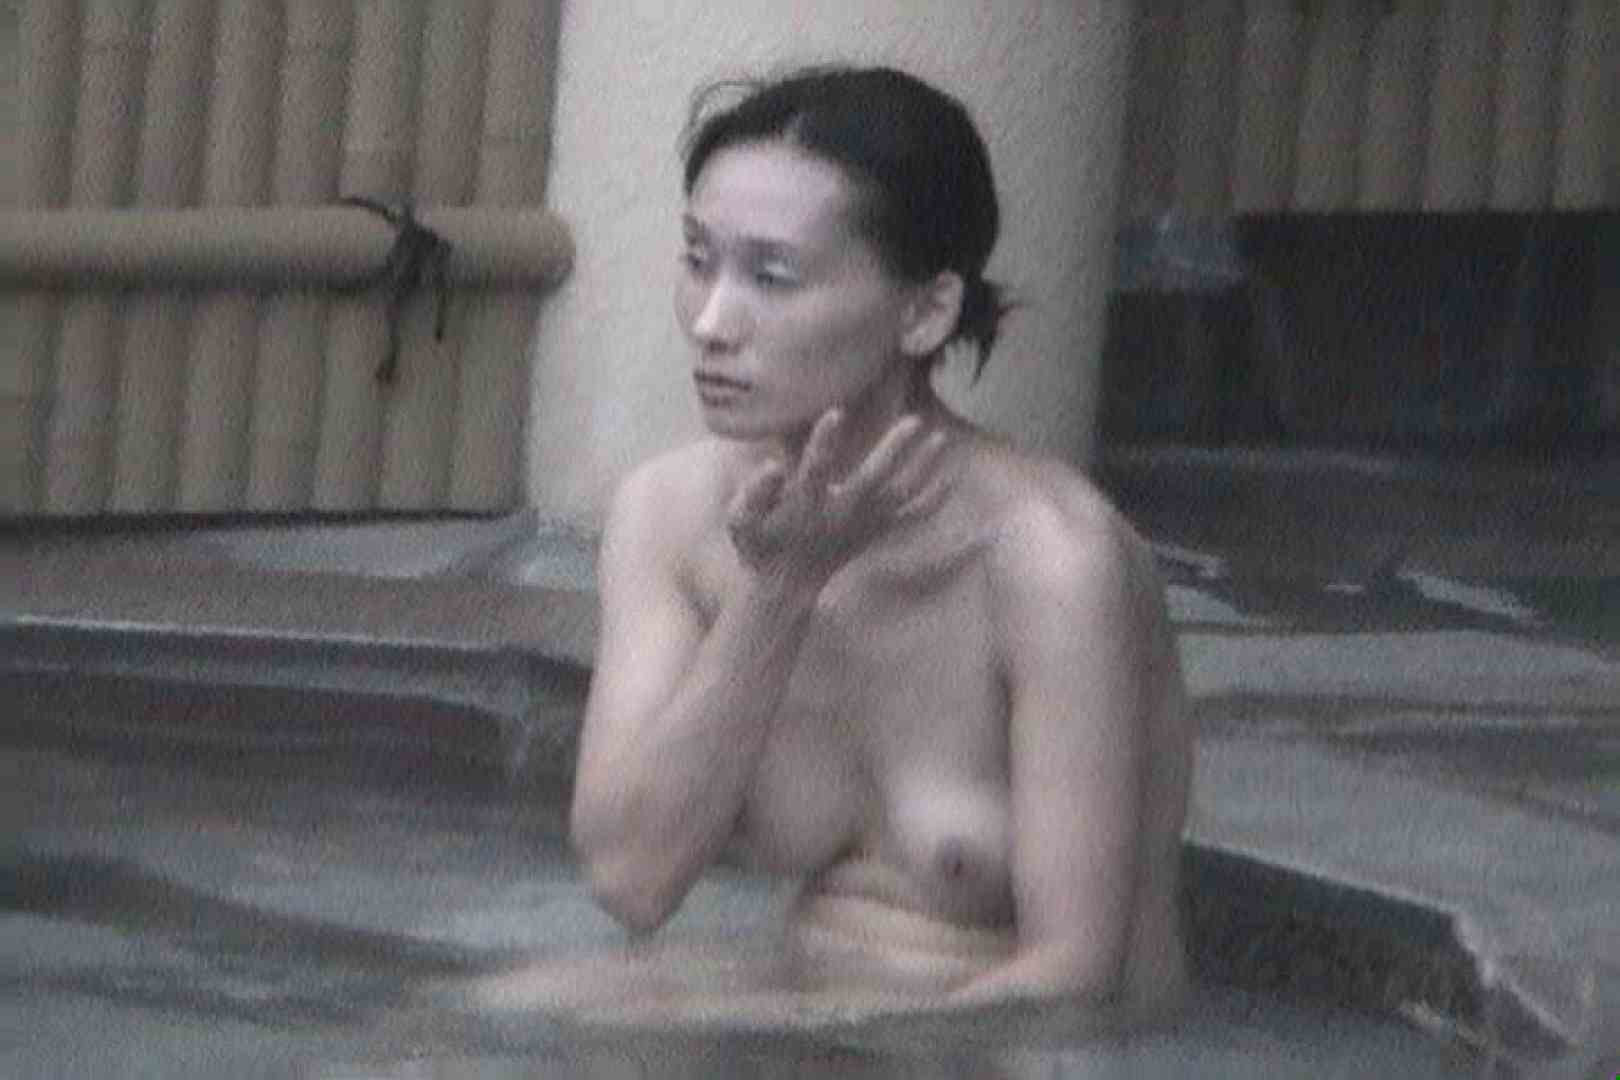 Aquaな露天風呂Vol.557 露天 われめAV動画紹介 78枚 74